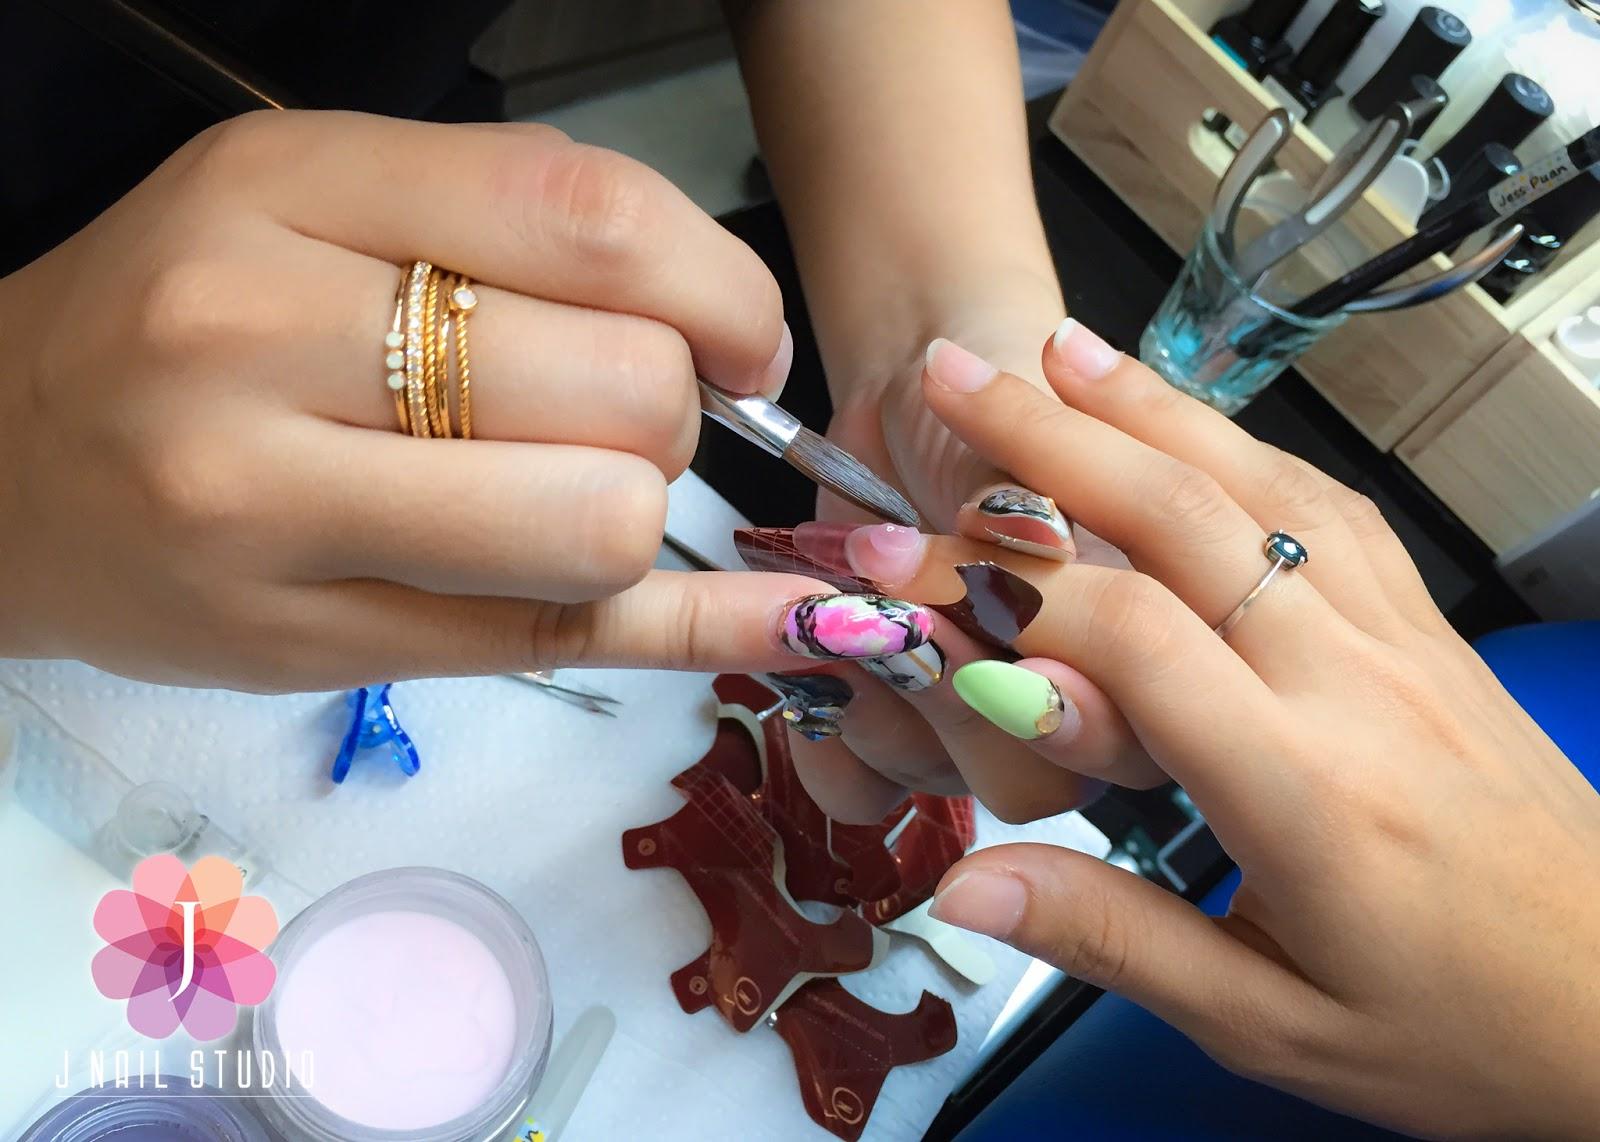 J Nail Studio: Nail Courses Singapore